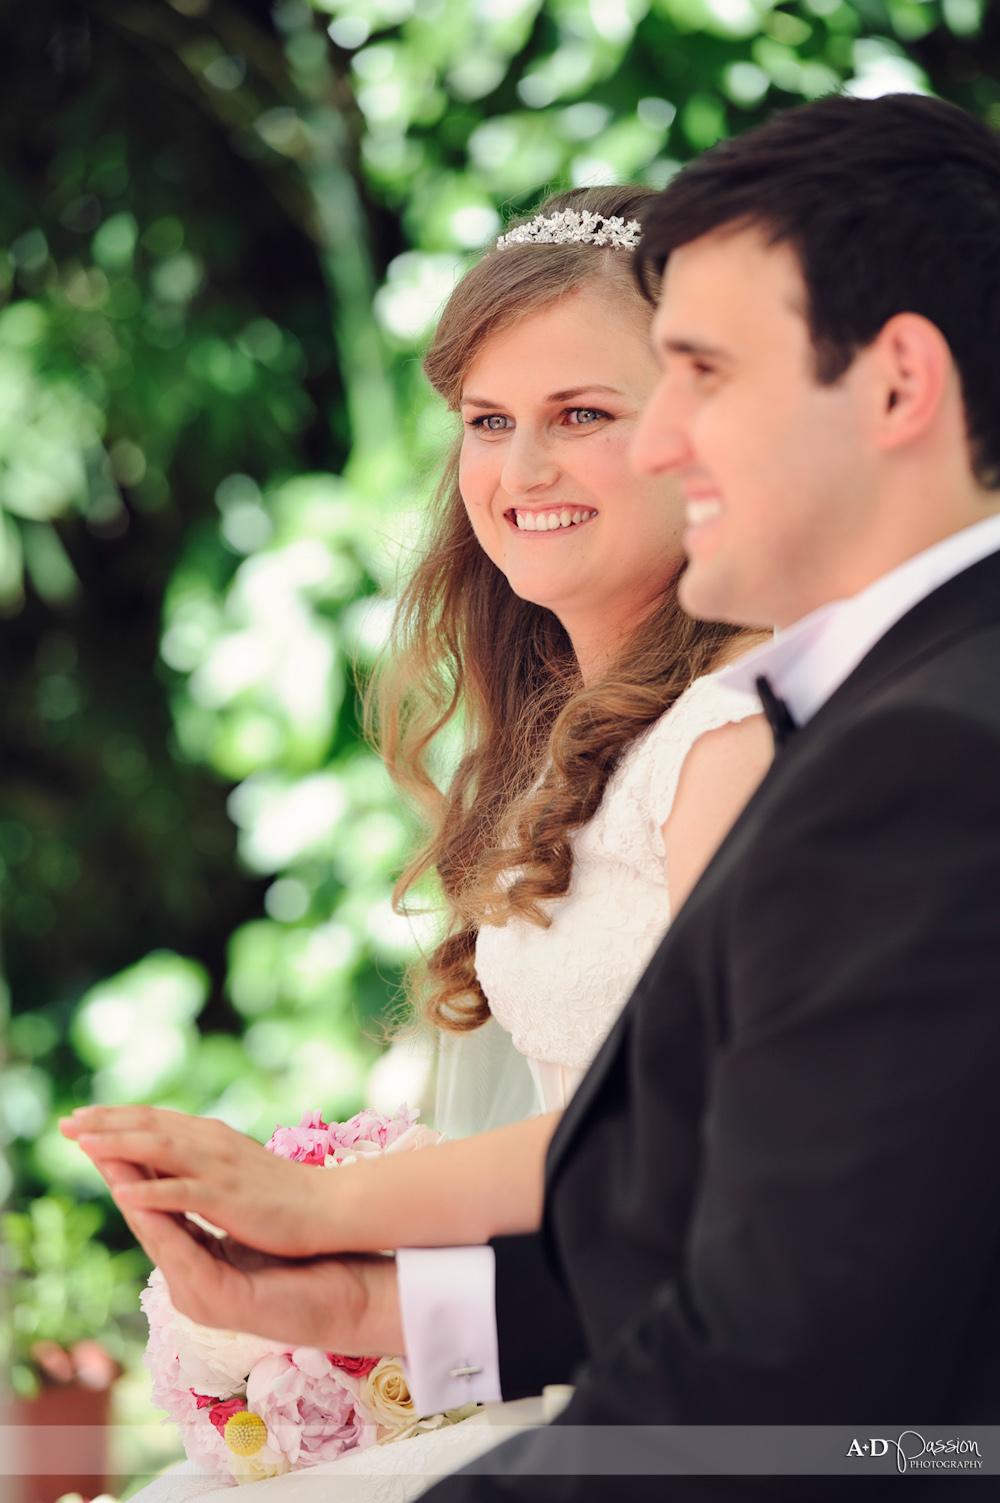 AD Passion Photography | ad-passion.com_fotograf-profesionist-nunta-spania_alice-si-eugen_0073 | Adelin, Dida, fotograf profesionist, fotograf de nunta, fotografie de nunta, fotograf Timisoara, fotograf Craiova, fotograf Bucuresti, fotograf Arad, nunta Timisoara, nunta Arad, nunta Bucuresti, nunta Craiova